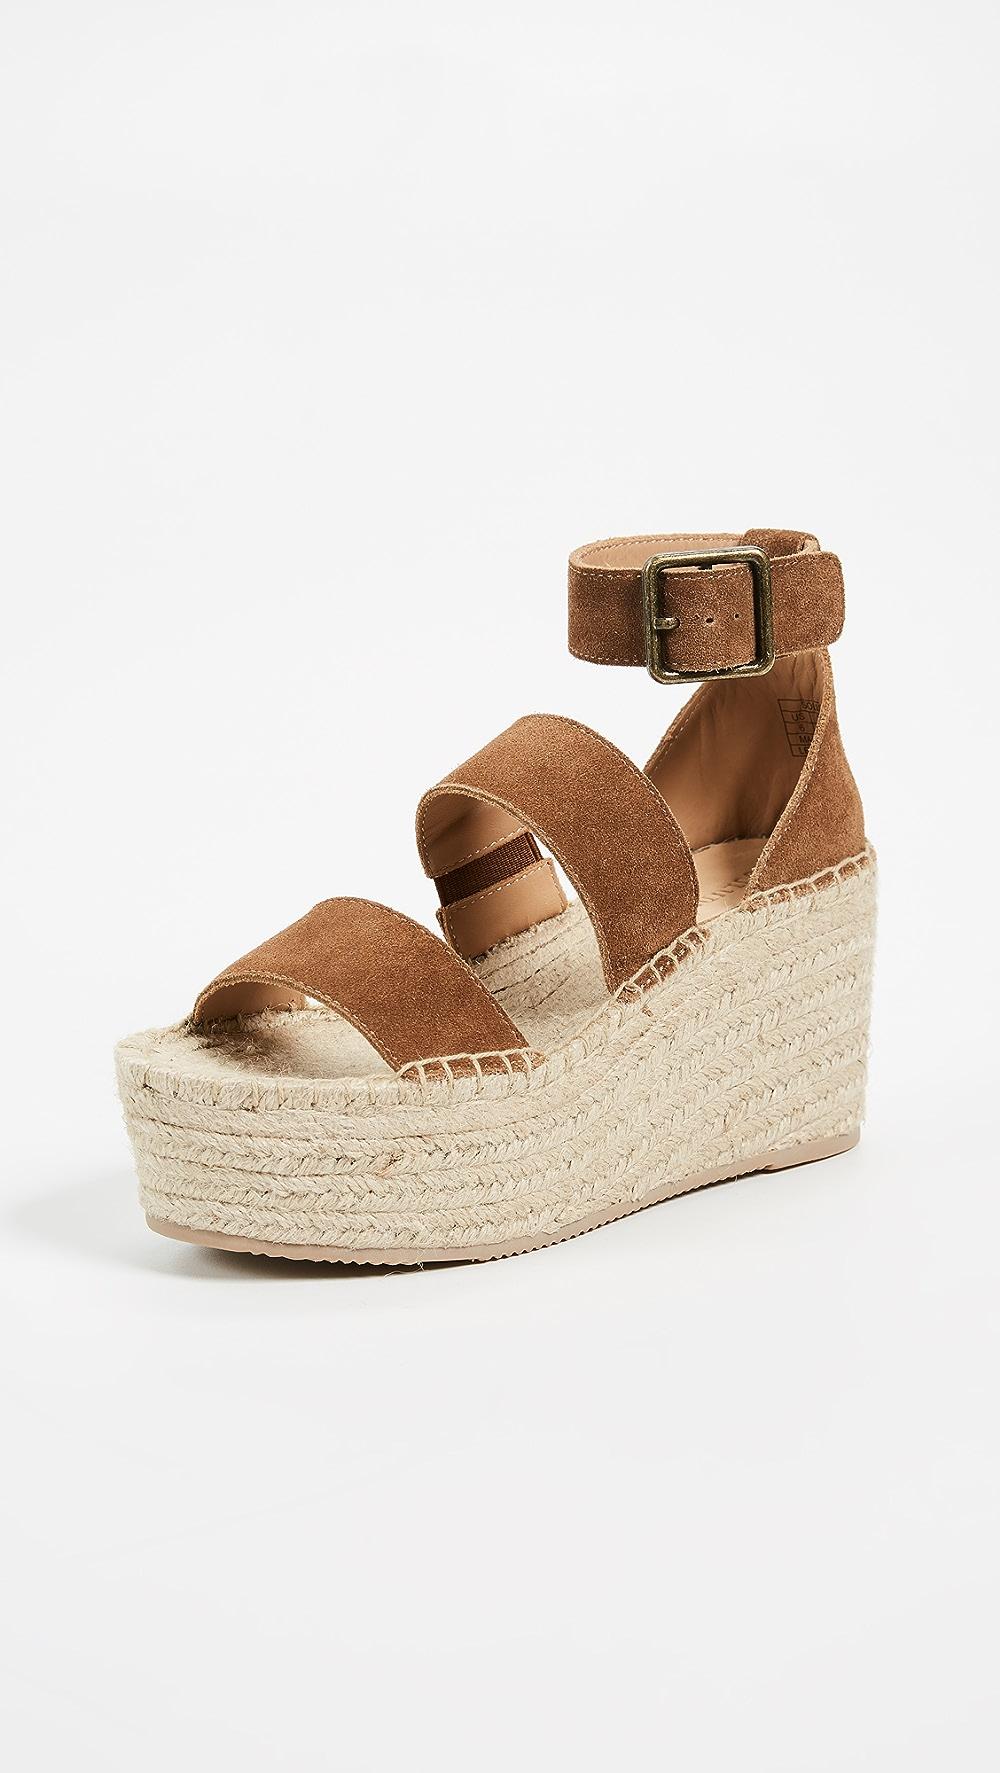 Adroit Soludos - Palma Platform Sandals The Latest Fashion